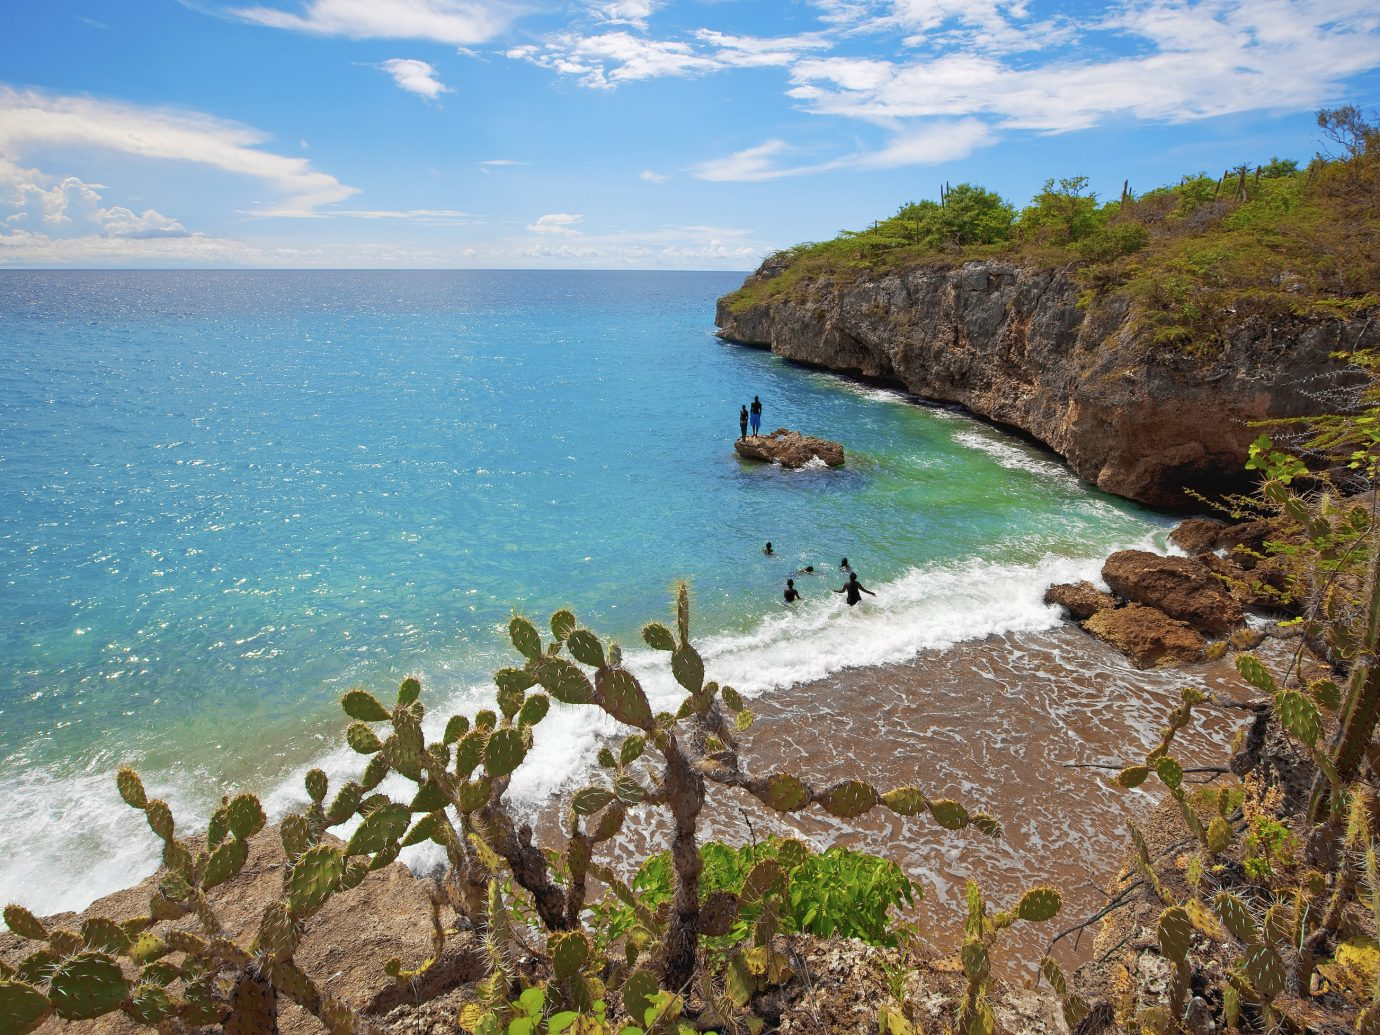 Beaches caribbean Trip Ideas water outdoor Nature Coast rock geographical feature landform Sea body of water shore Beach cliff Ocean vacation bay cove cape terrain islet Island tropics Lagoon